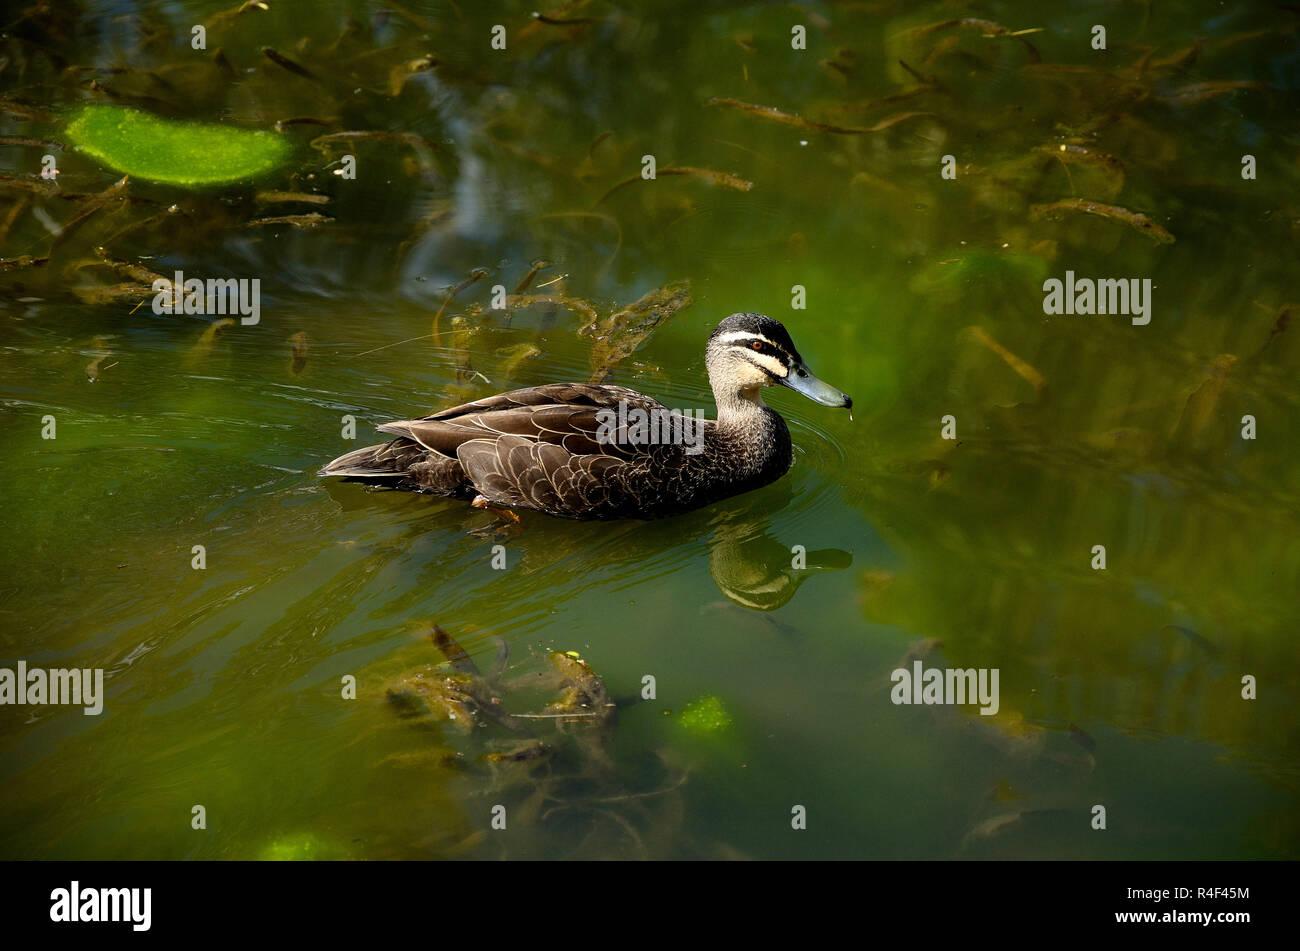 Duck calming swimming in a green pond in Dubbo, Australia Stock Photo